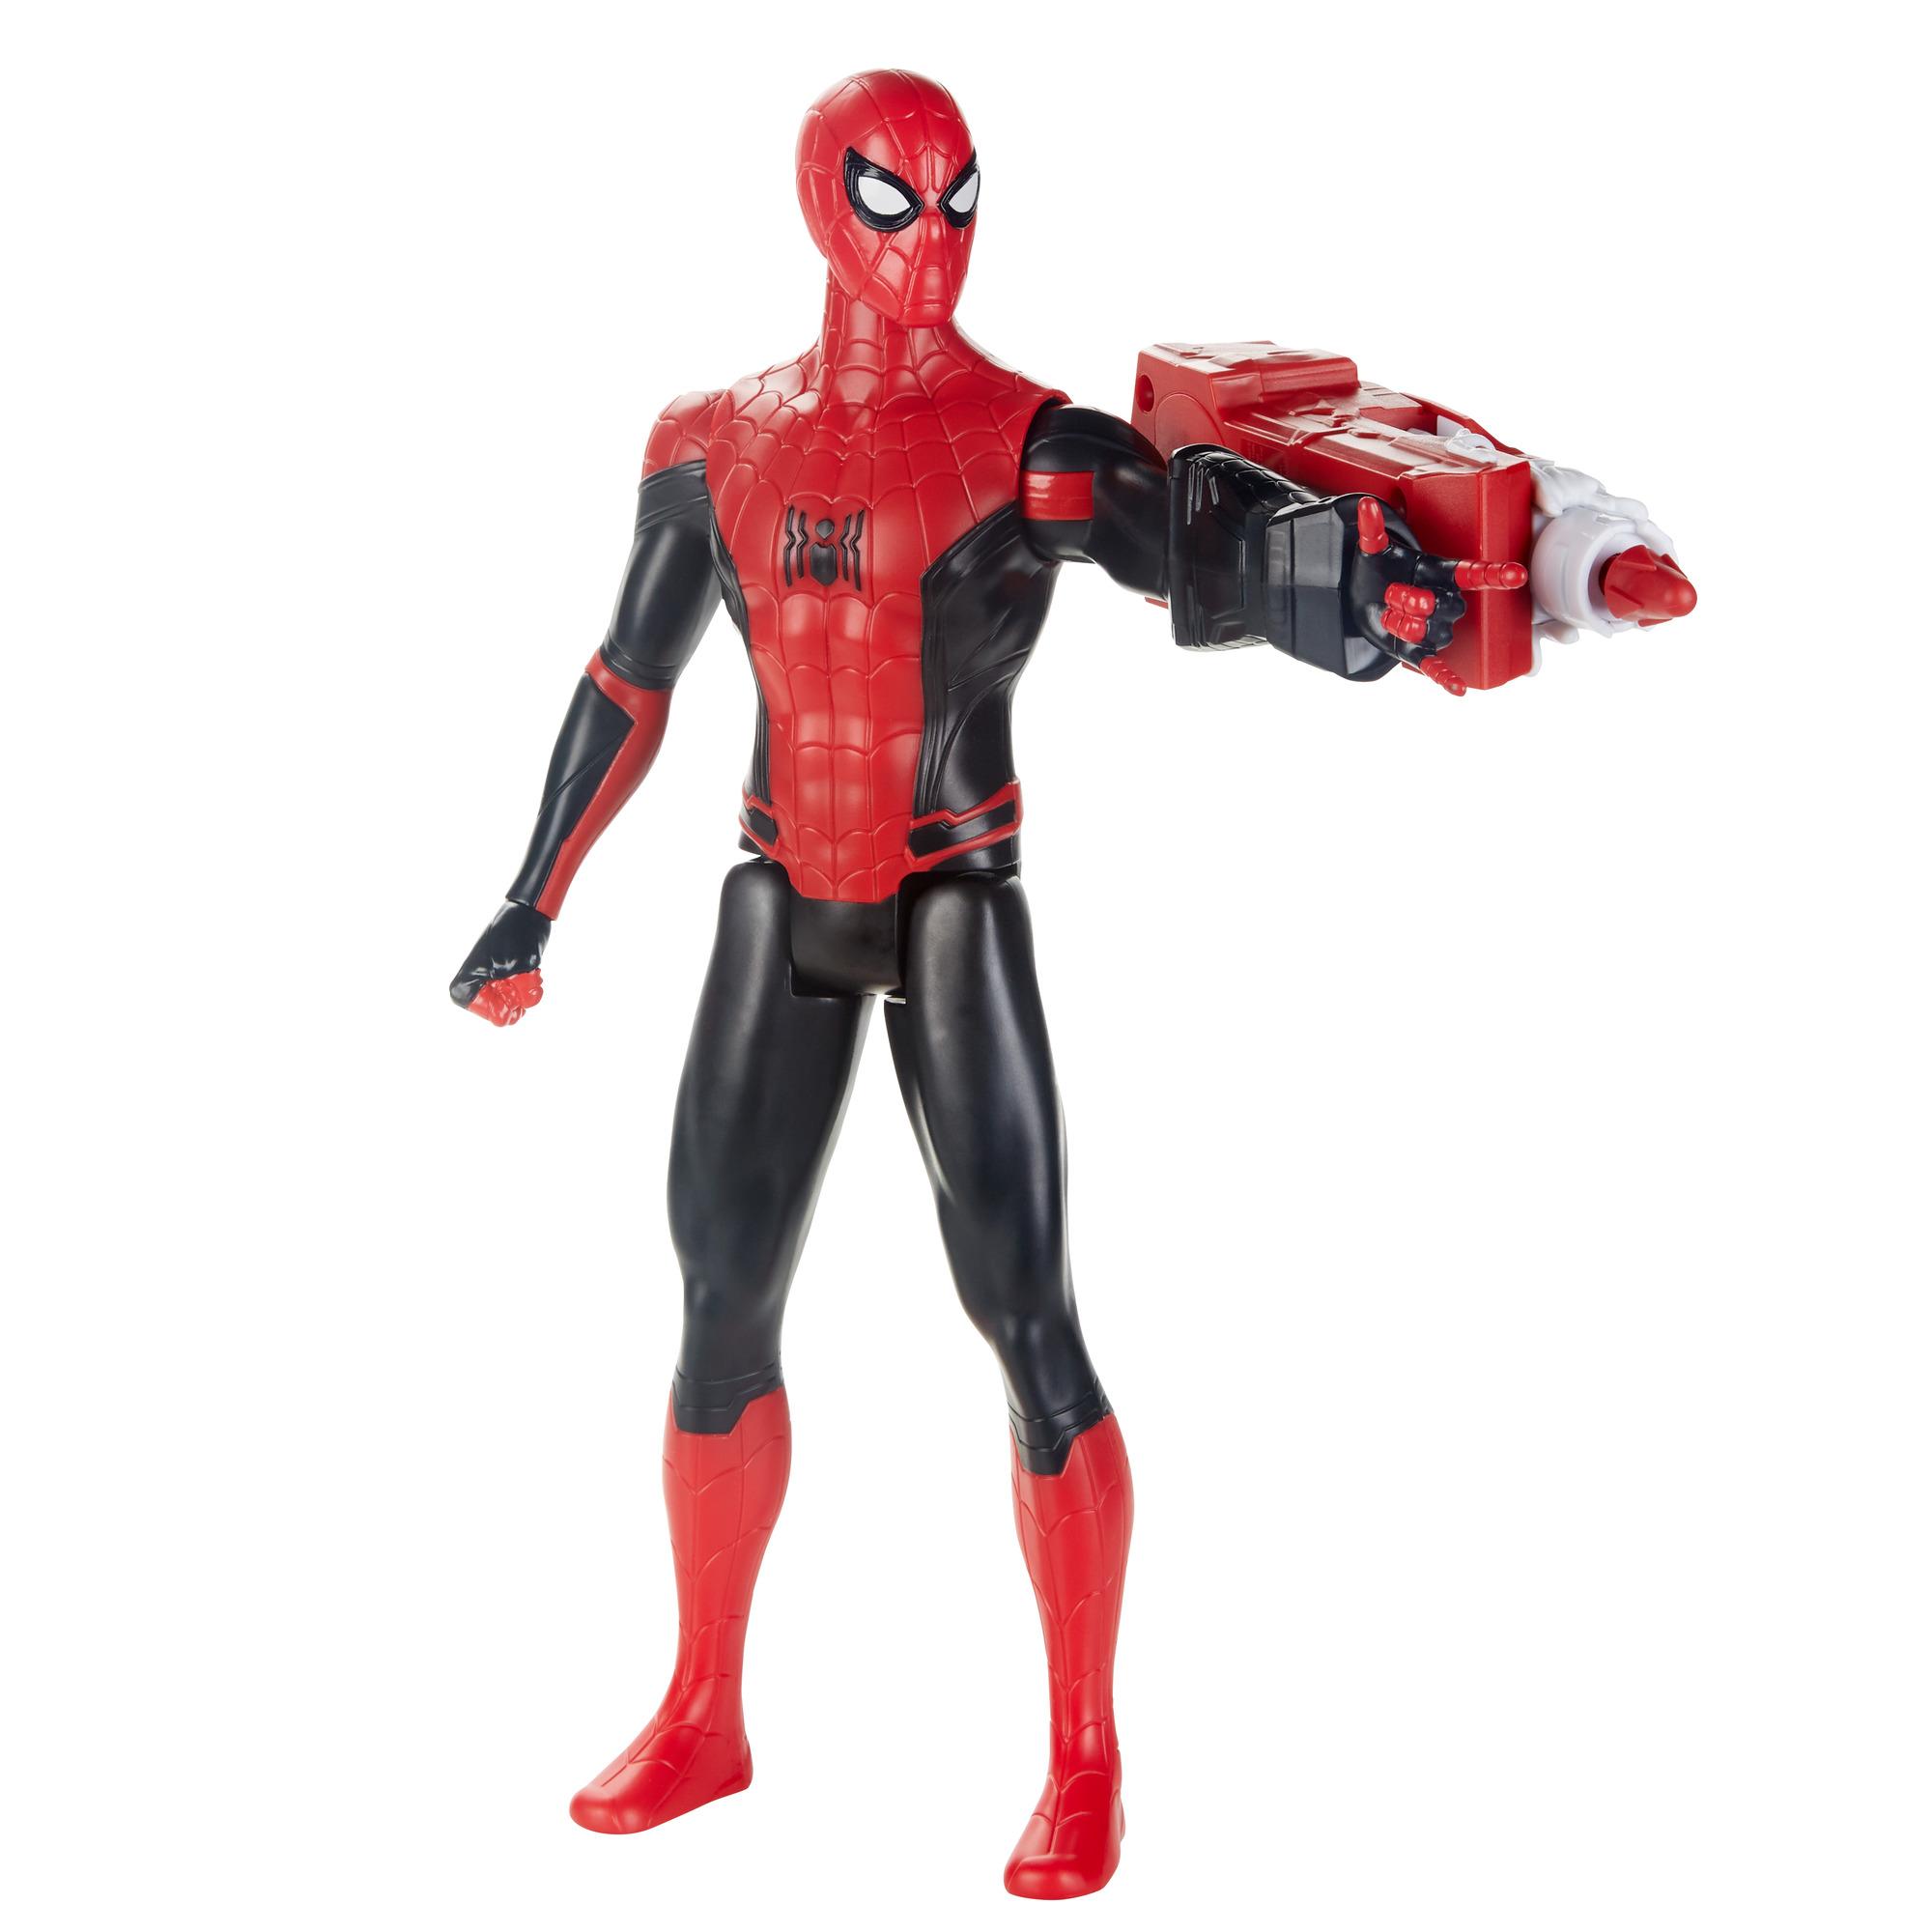 Spider-Man Titan Hero Series Figure